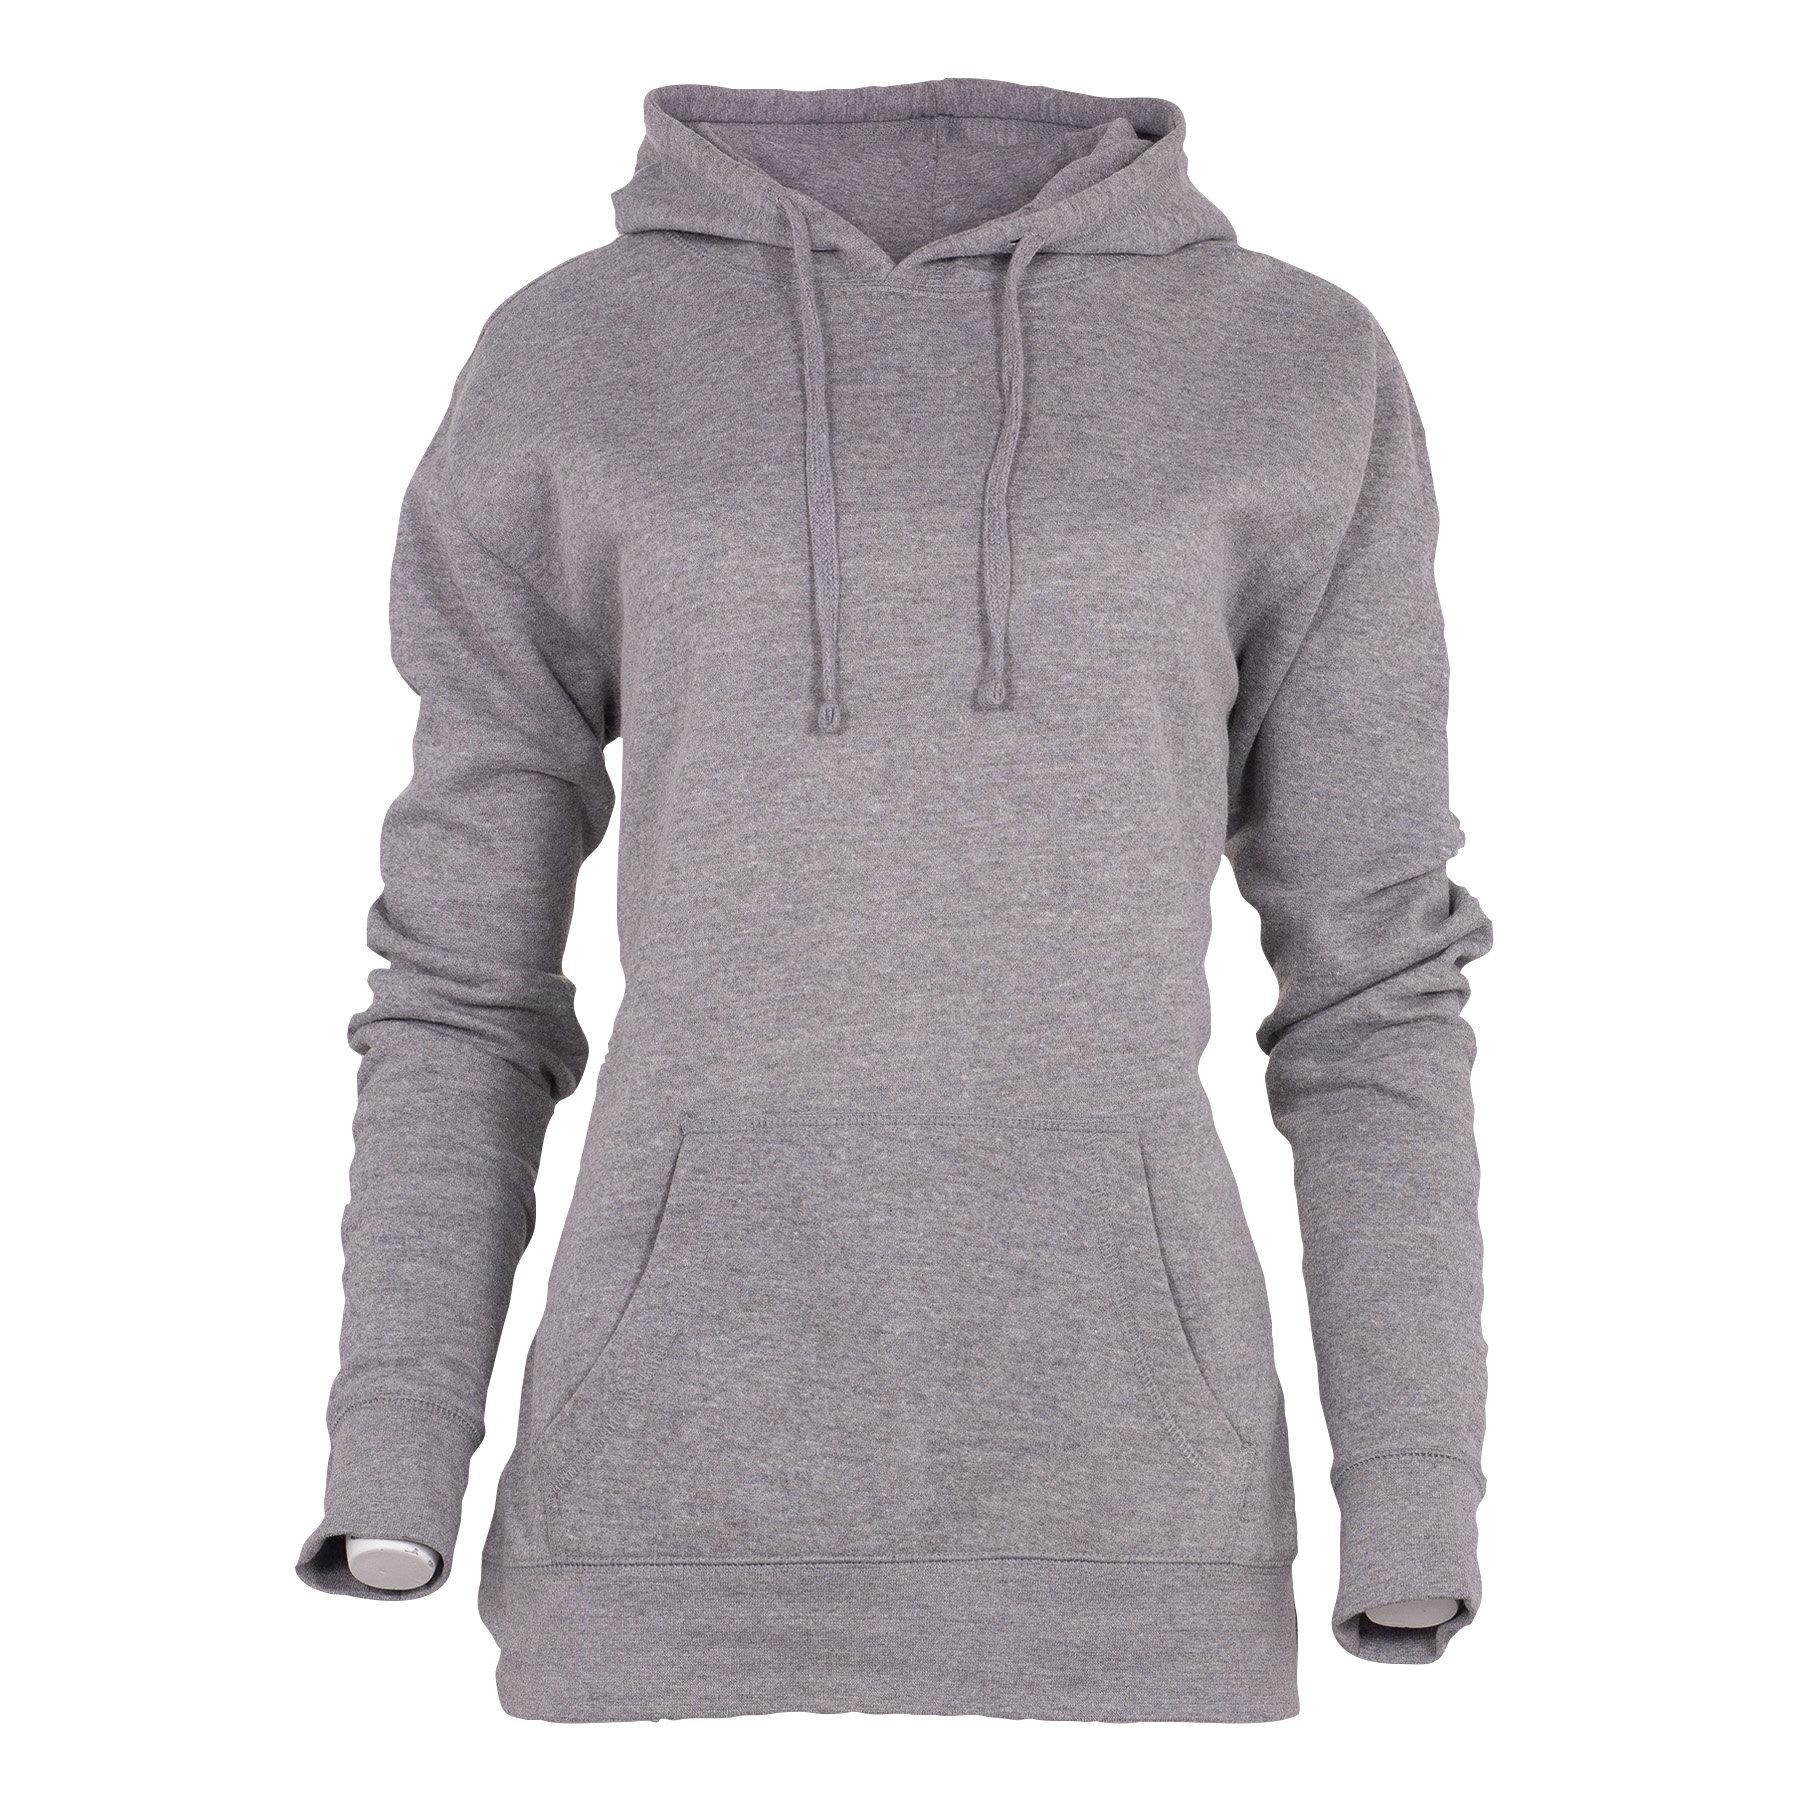 Ouray Sportswear NCAA BYU Cougars Womens Spirit Hood